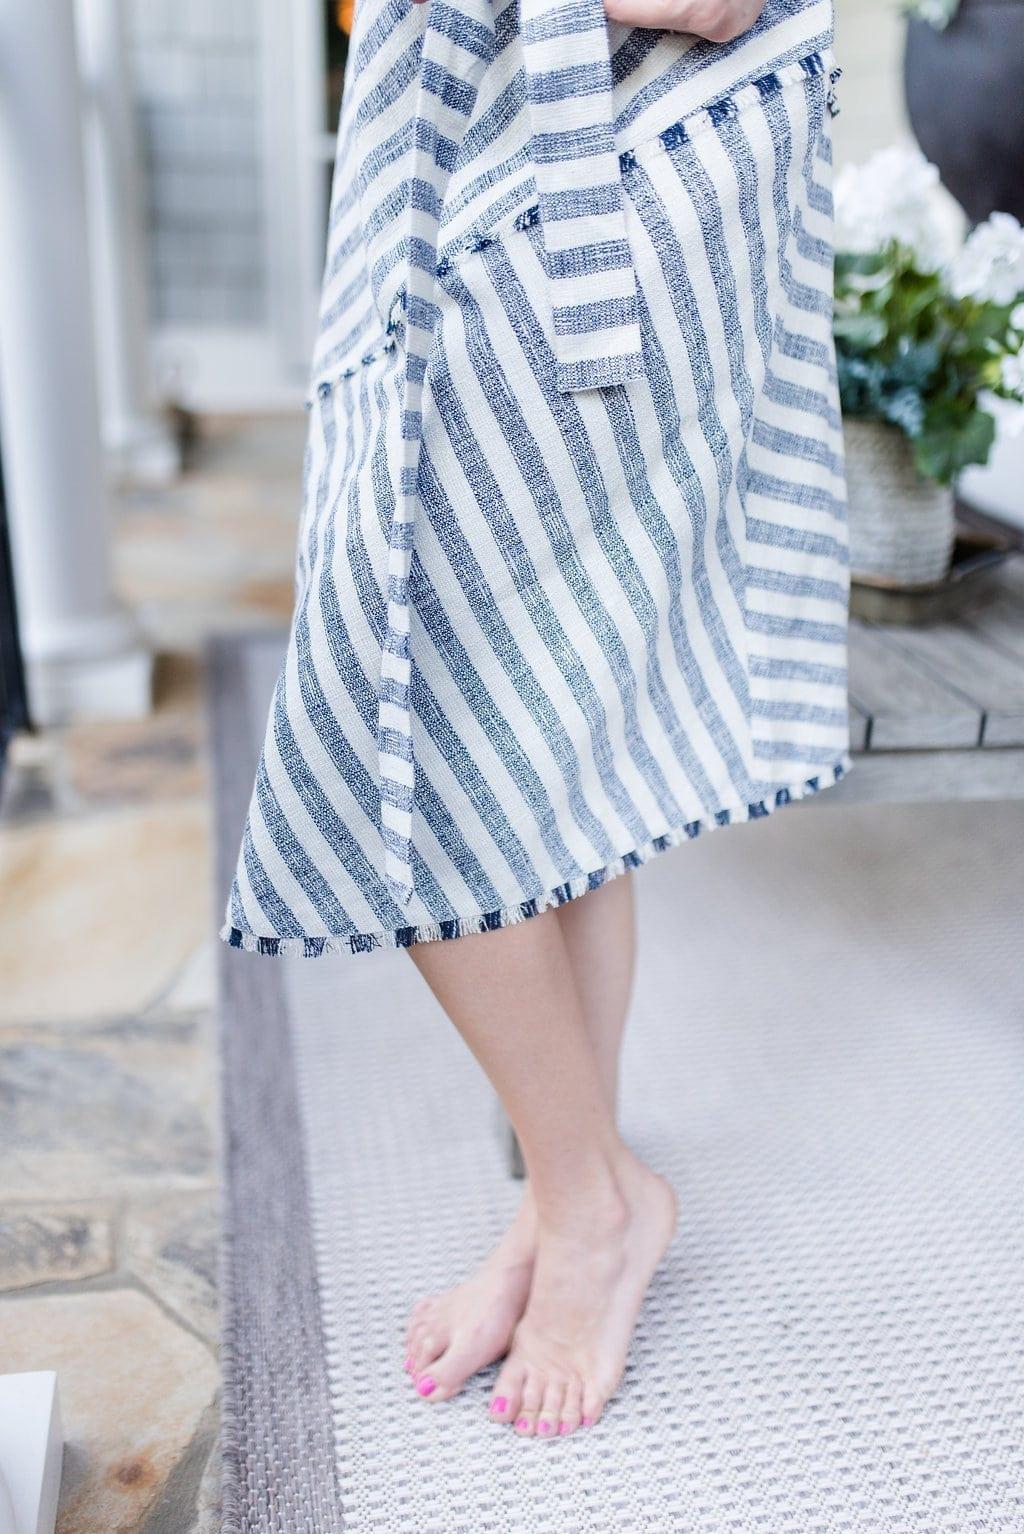 Asymmetrical dress from Banana Republic.